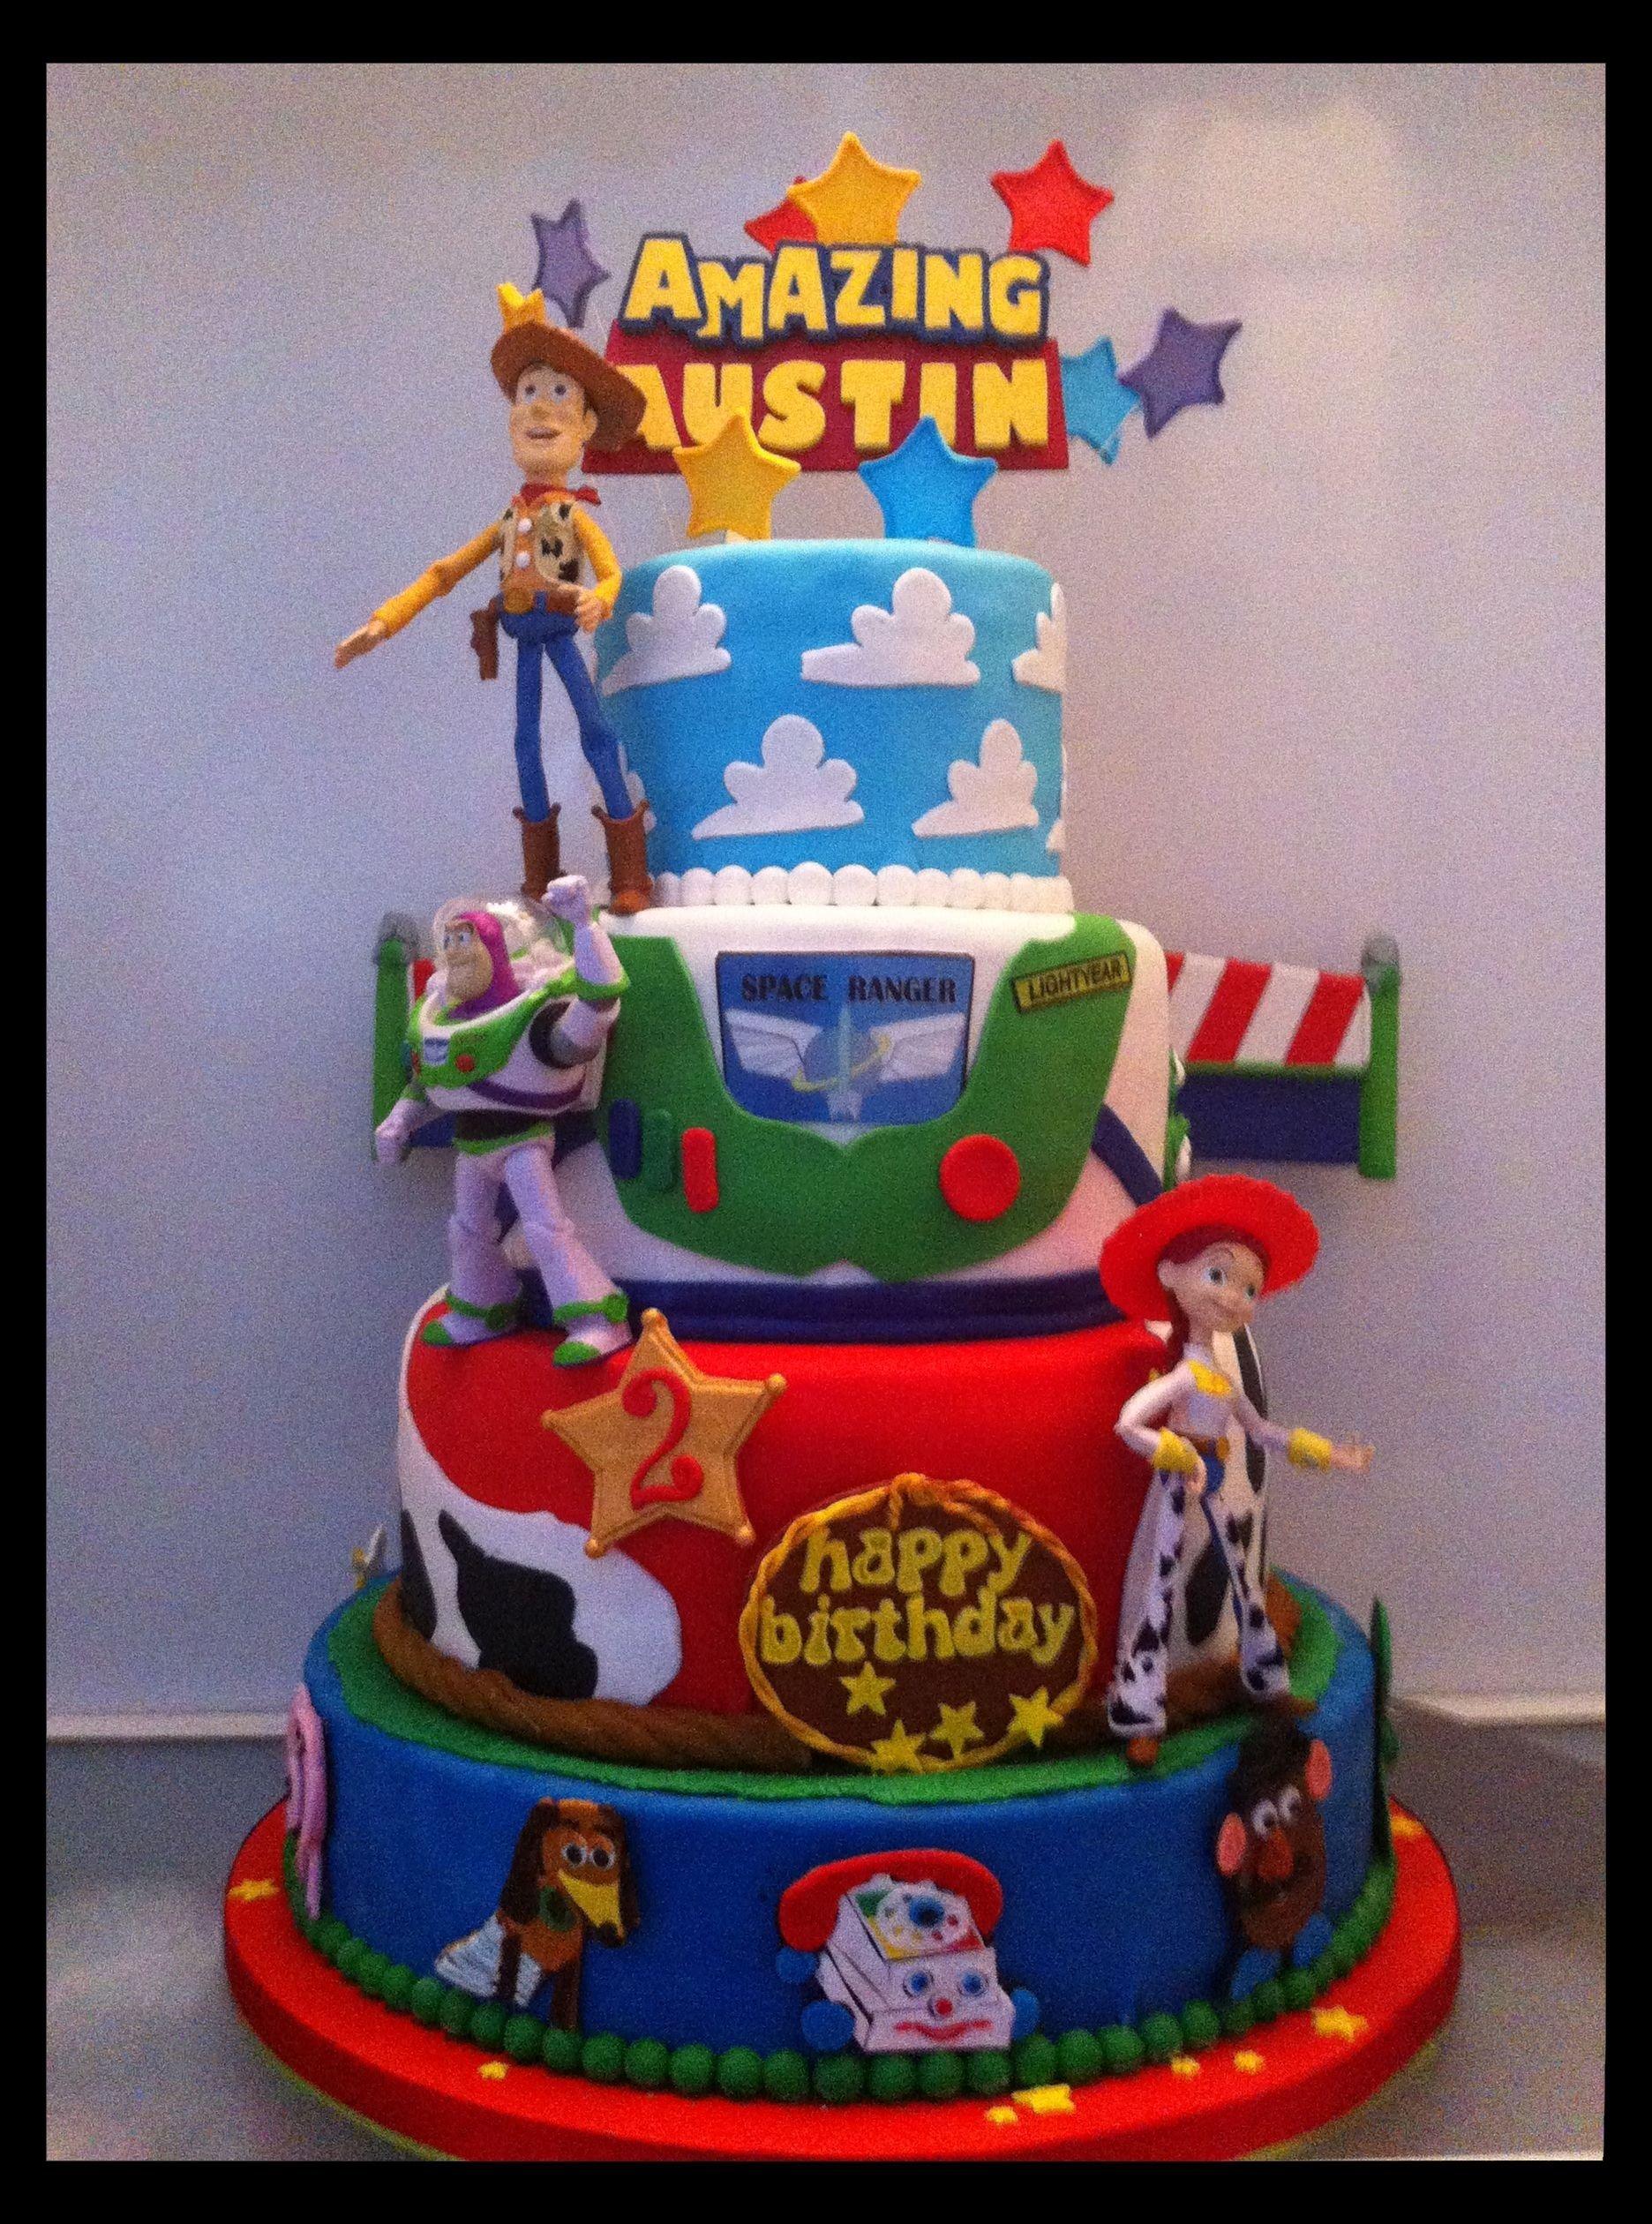 10 Spectacular Toy Story Birthday Cake Ideas birthday cake toy story kids toy story birthday party pinterest 2020